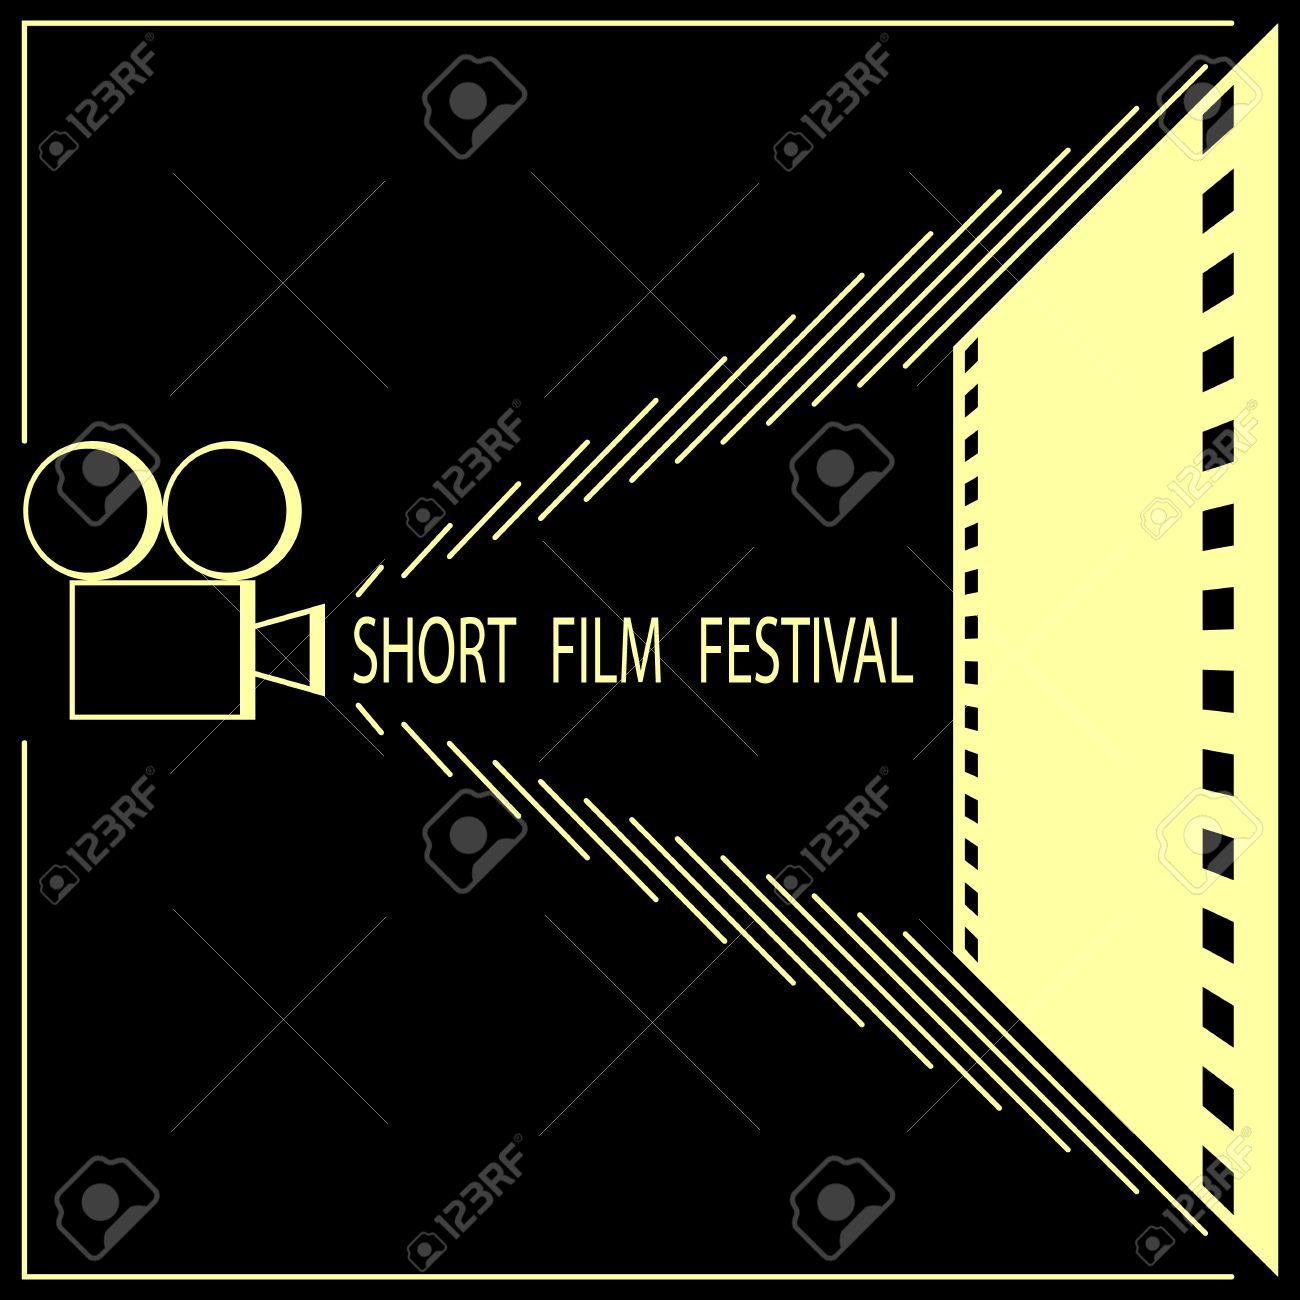 Short Film Festival Cinema Poster Template Black And Gold Vector Illustration